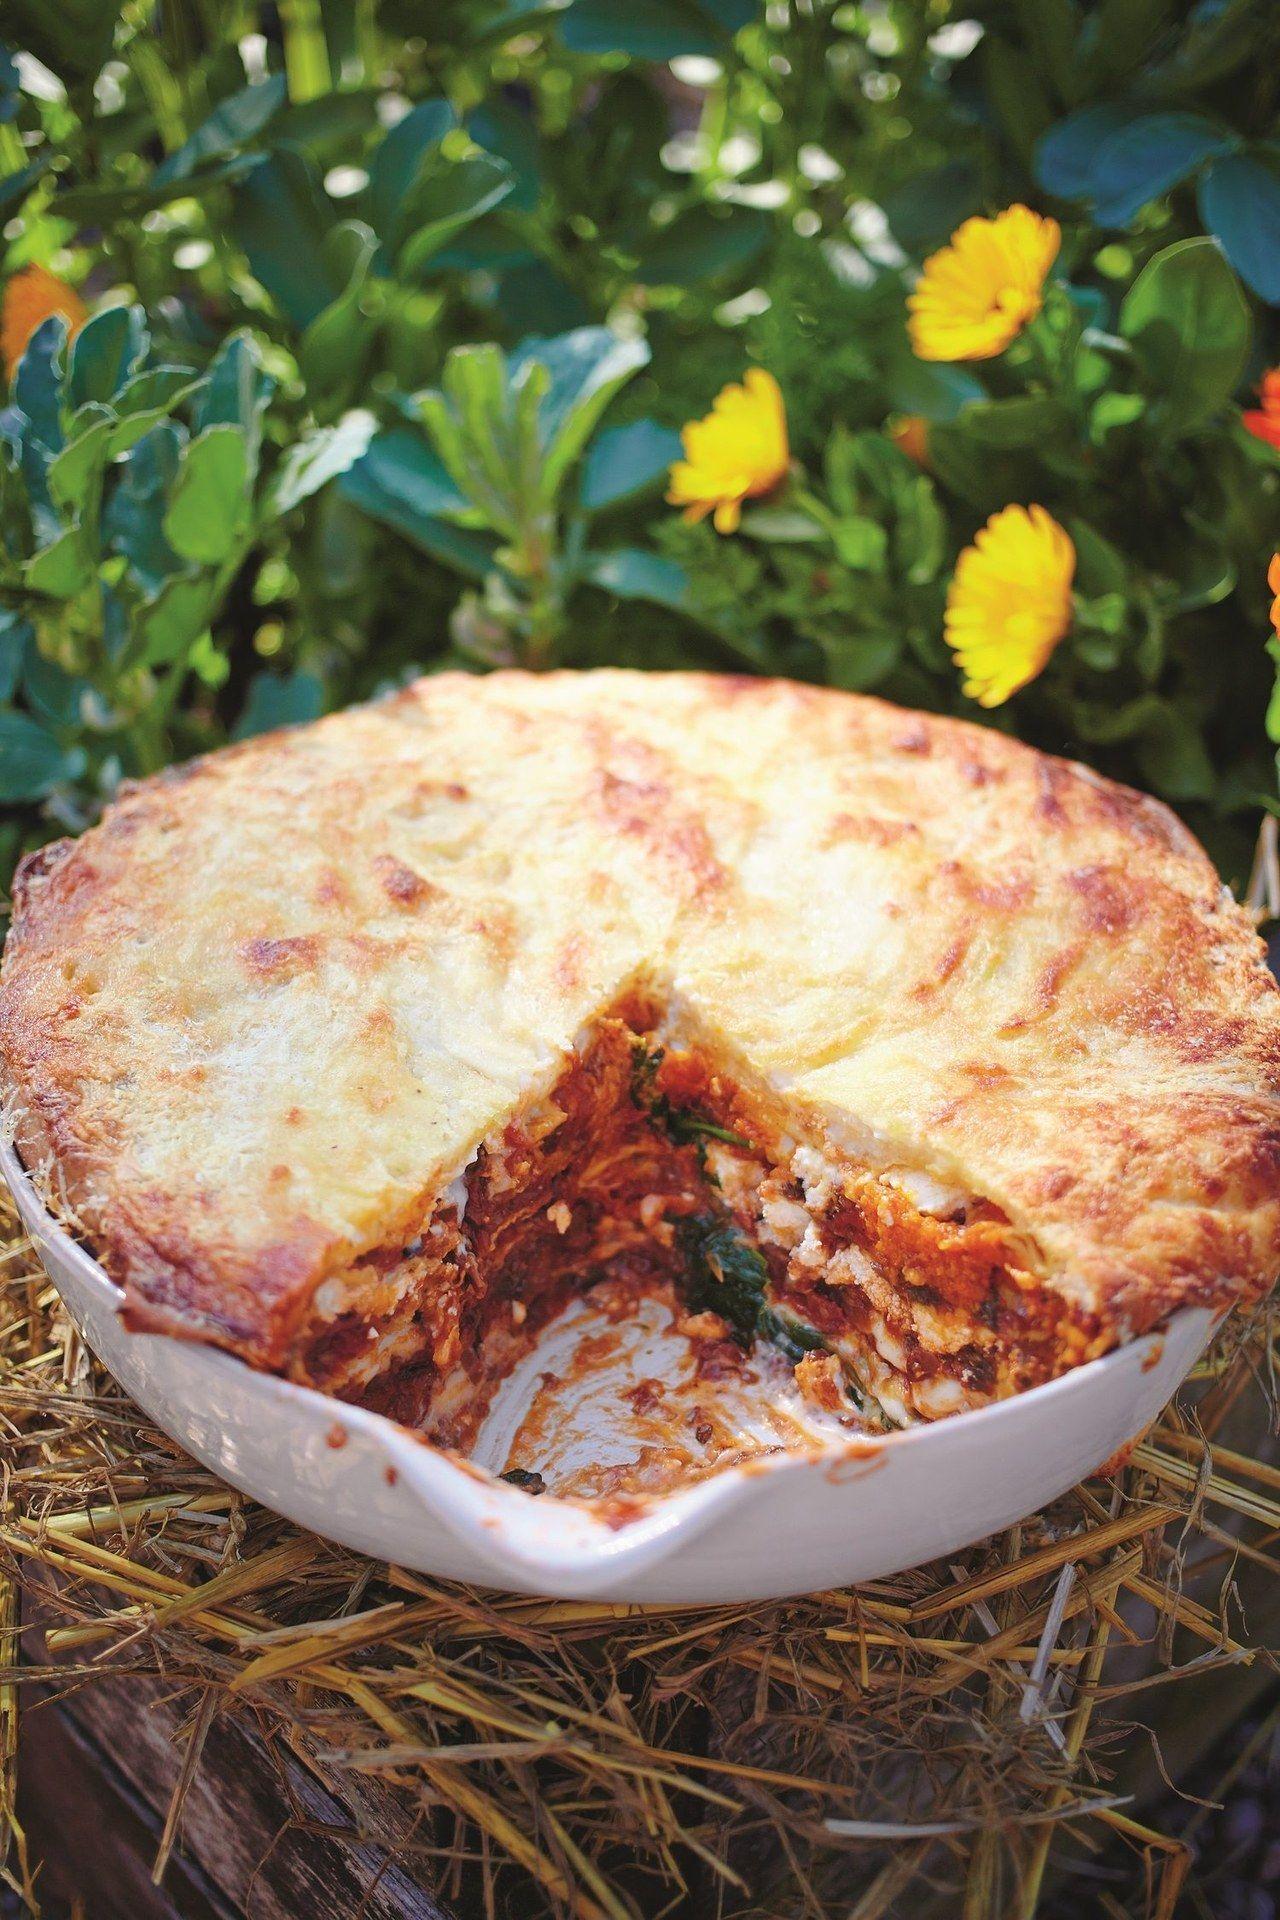 How To Make Jamie Oliver S Vegetarian Lasagna From Scratch Lasagna